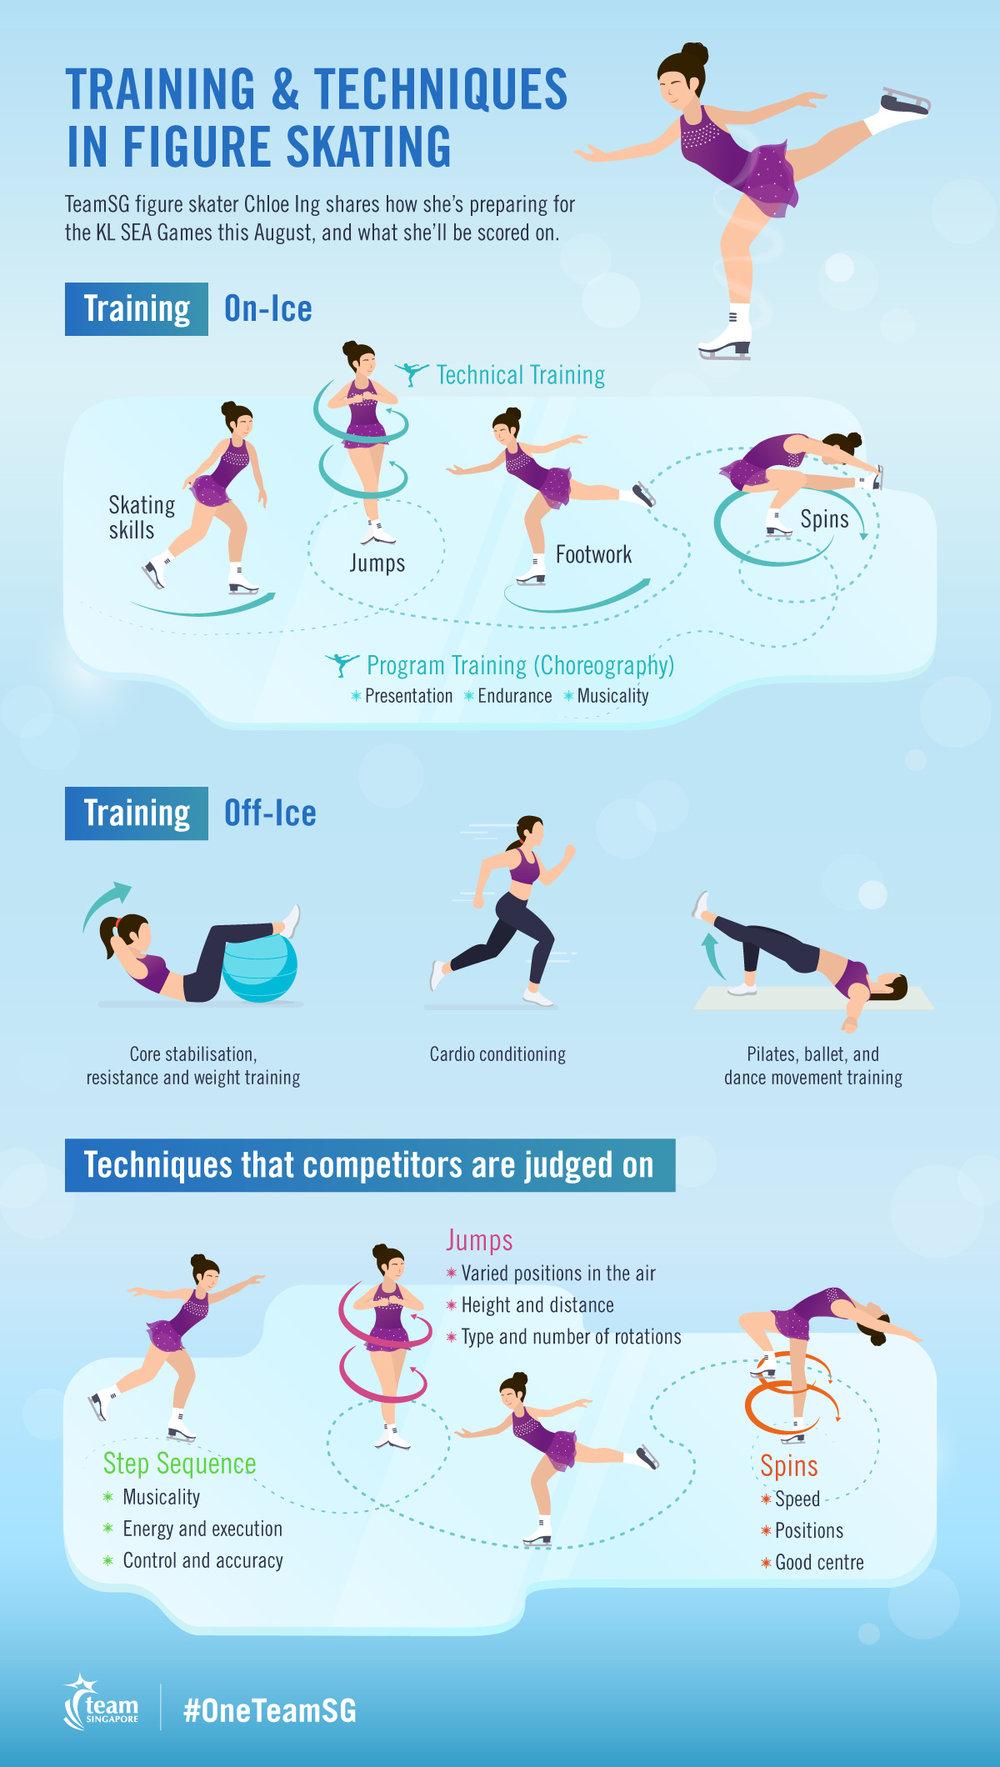 TeamSG-SEAgames-Infographic-FigureSkating.jpg